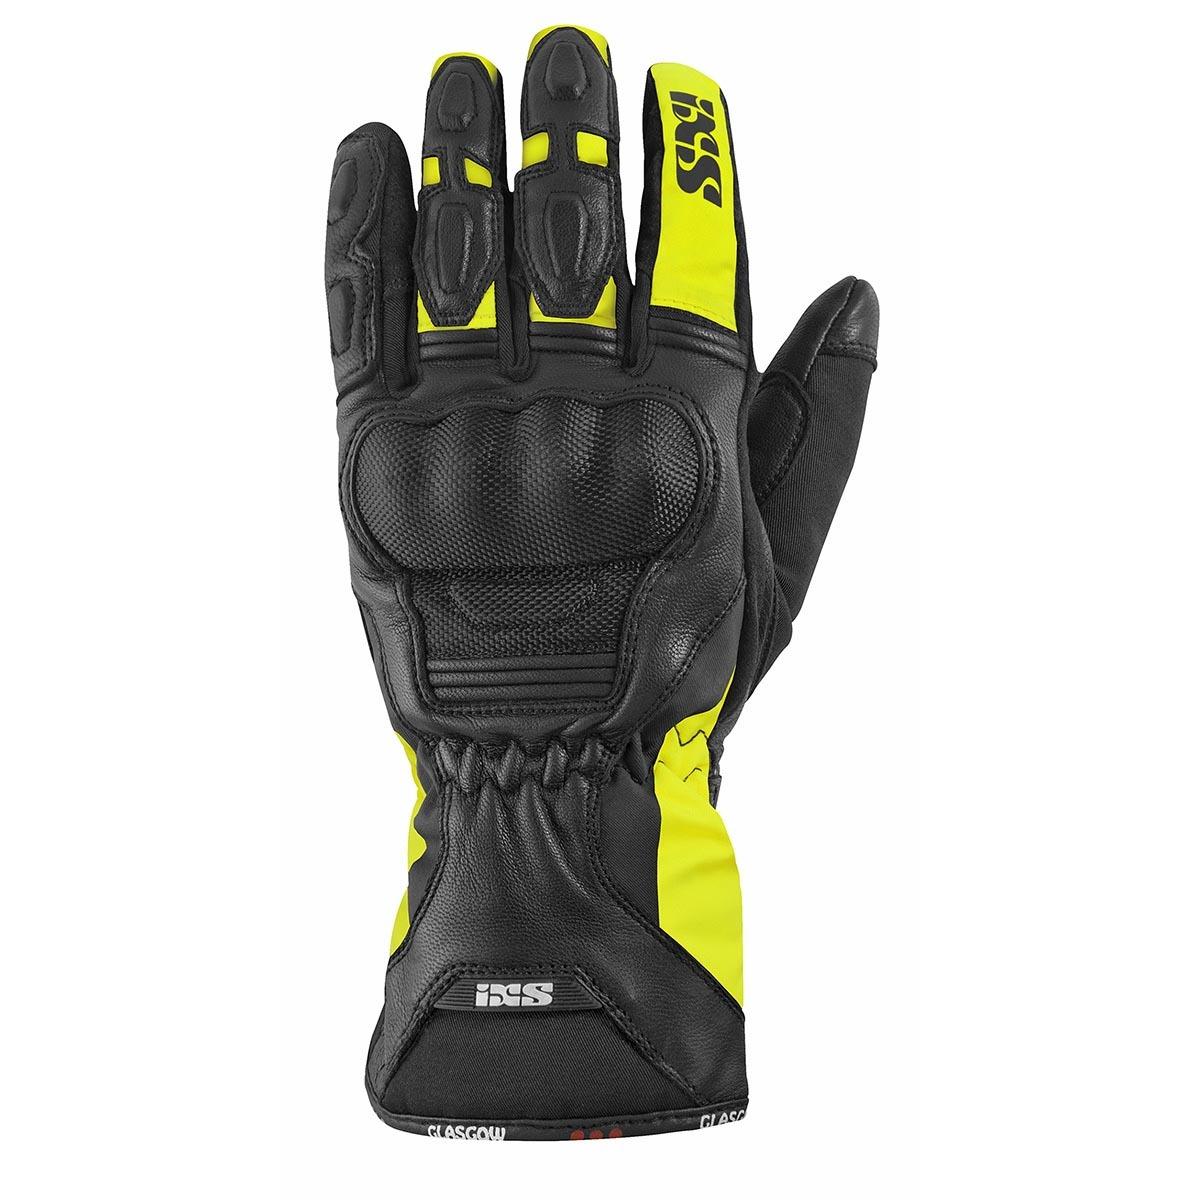 IXS GLASGOW WOMEN black/yellow